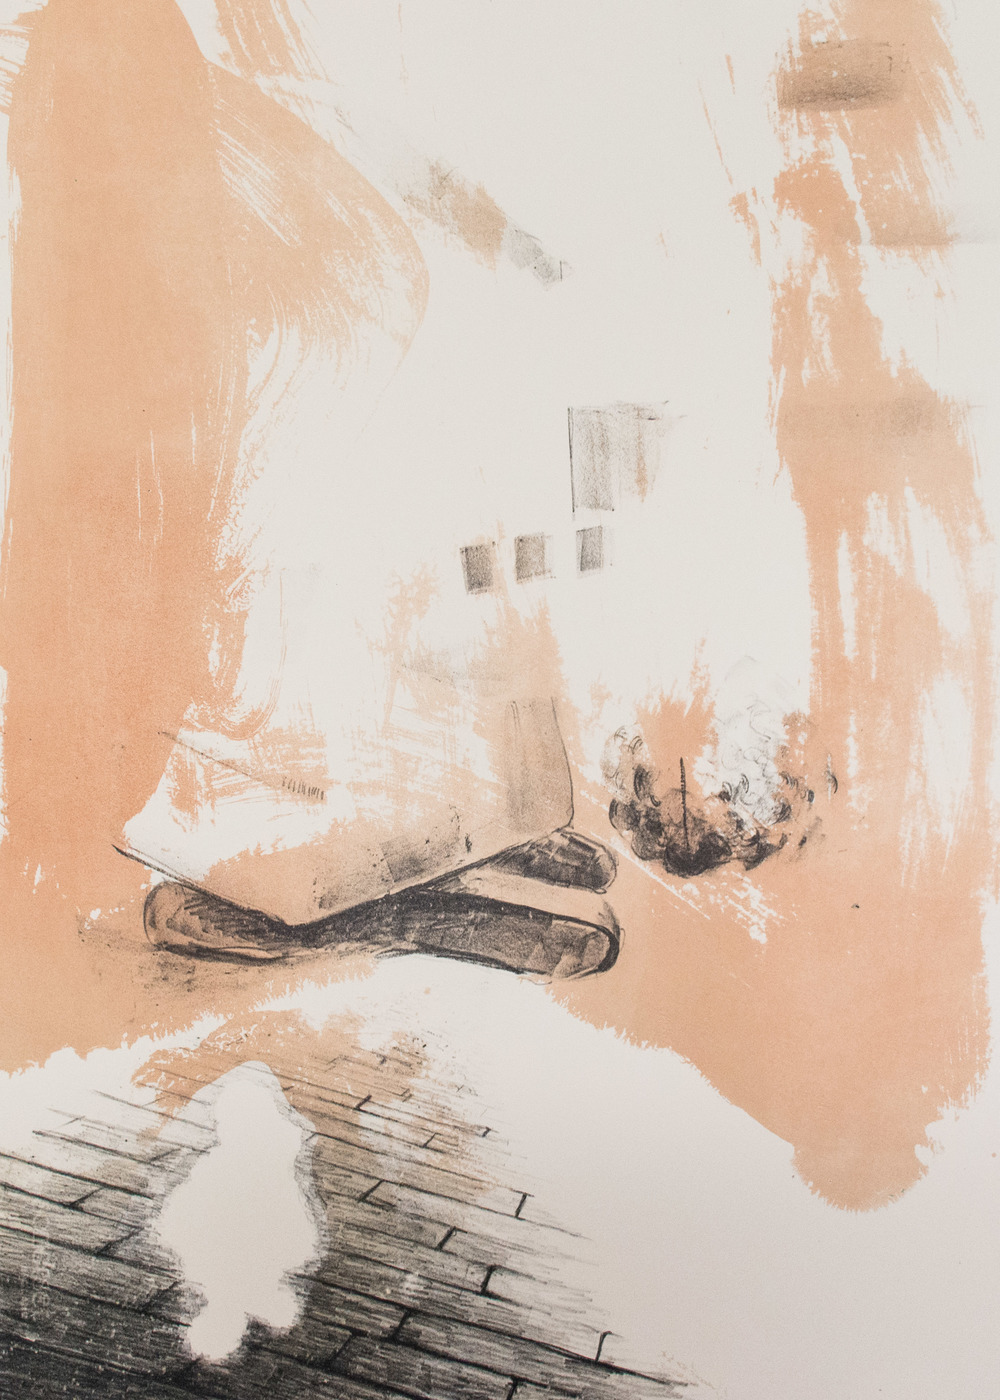 Departure , stone lithography (石板画), 22x30 inches,mono-print, 2014